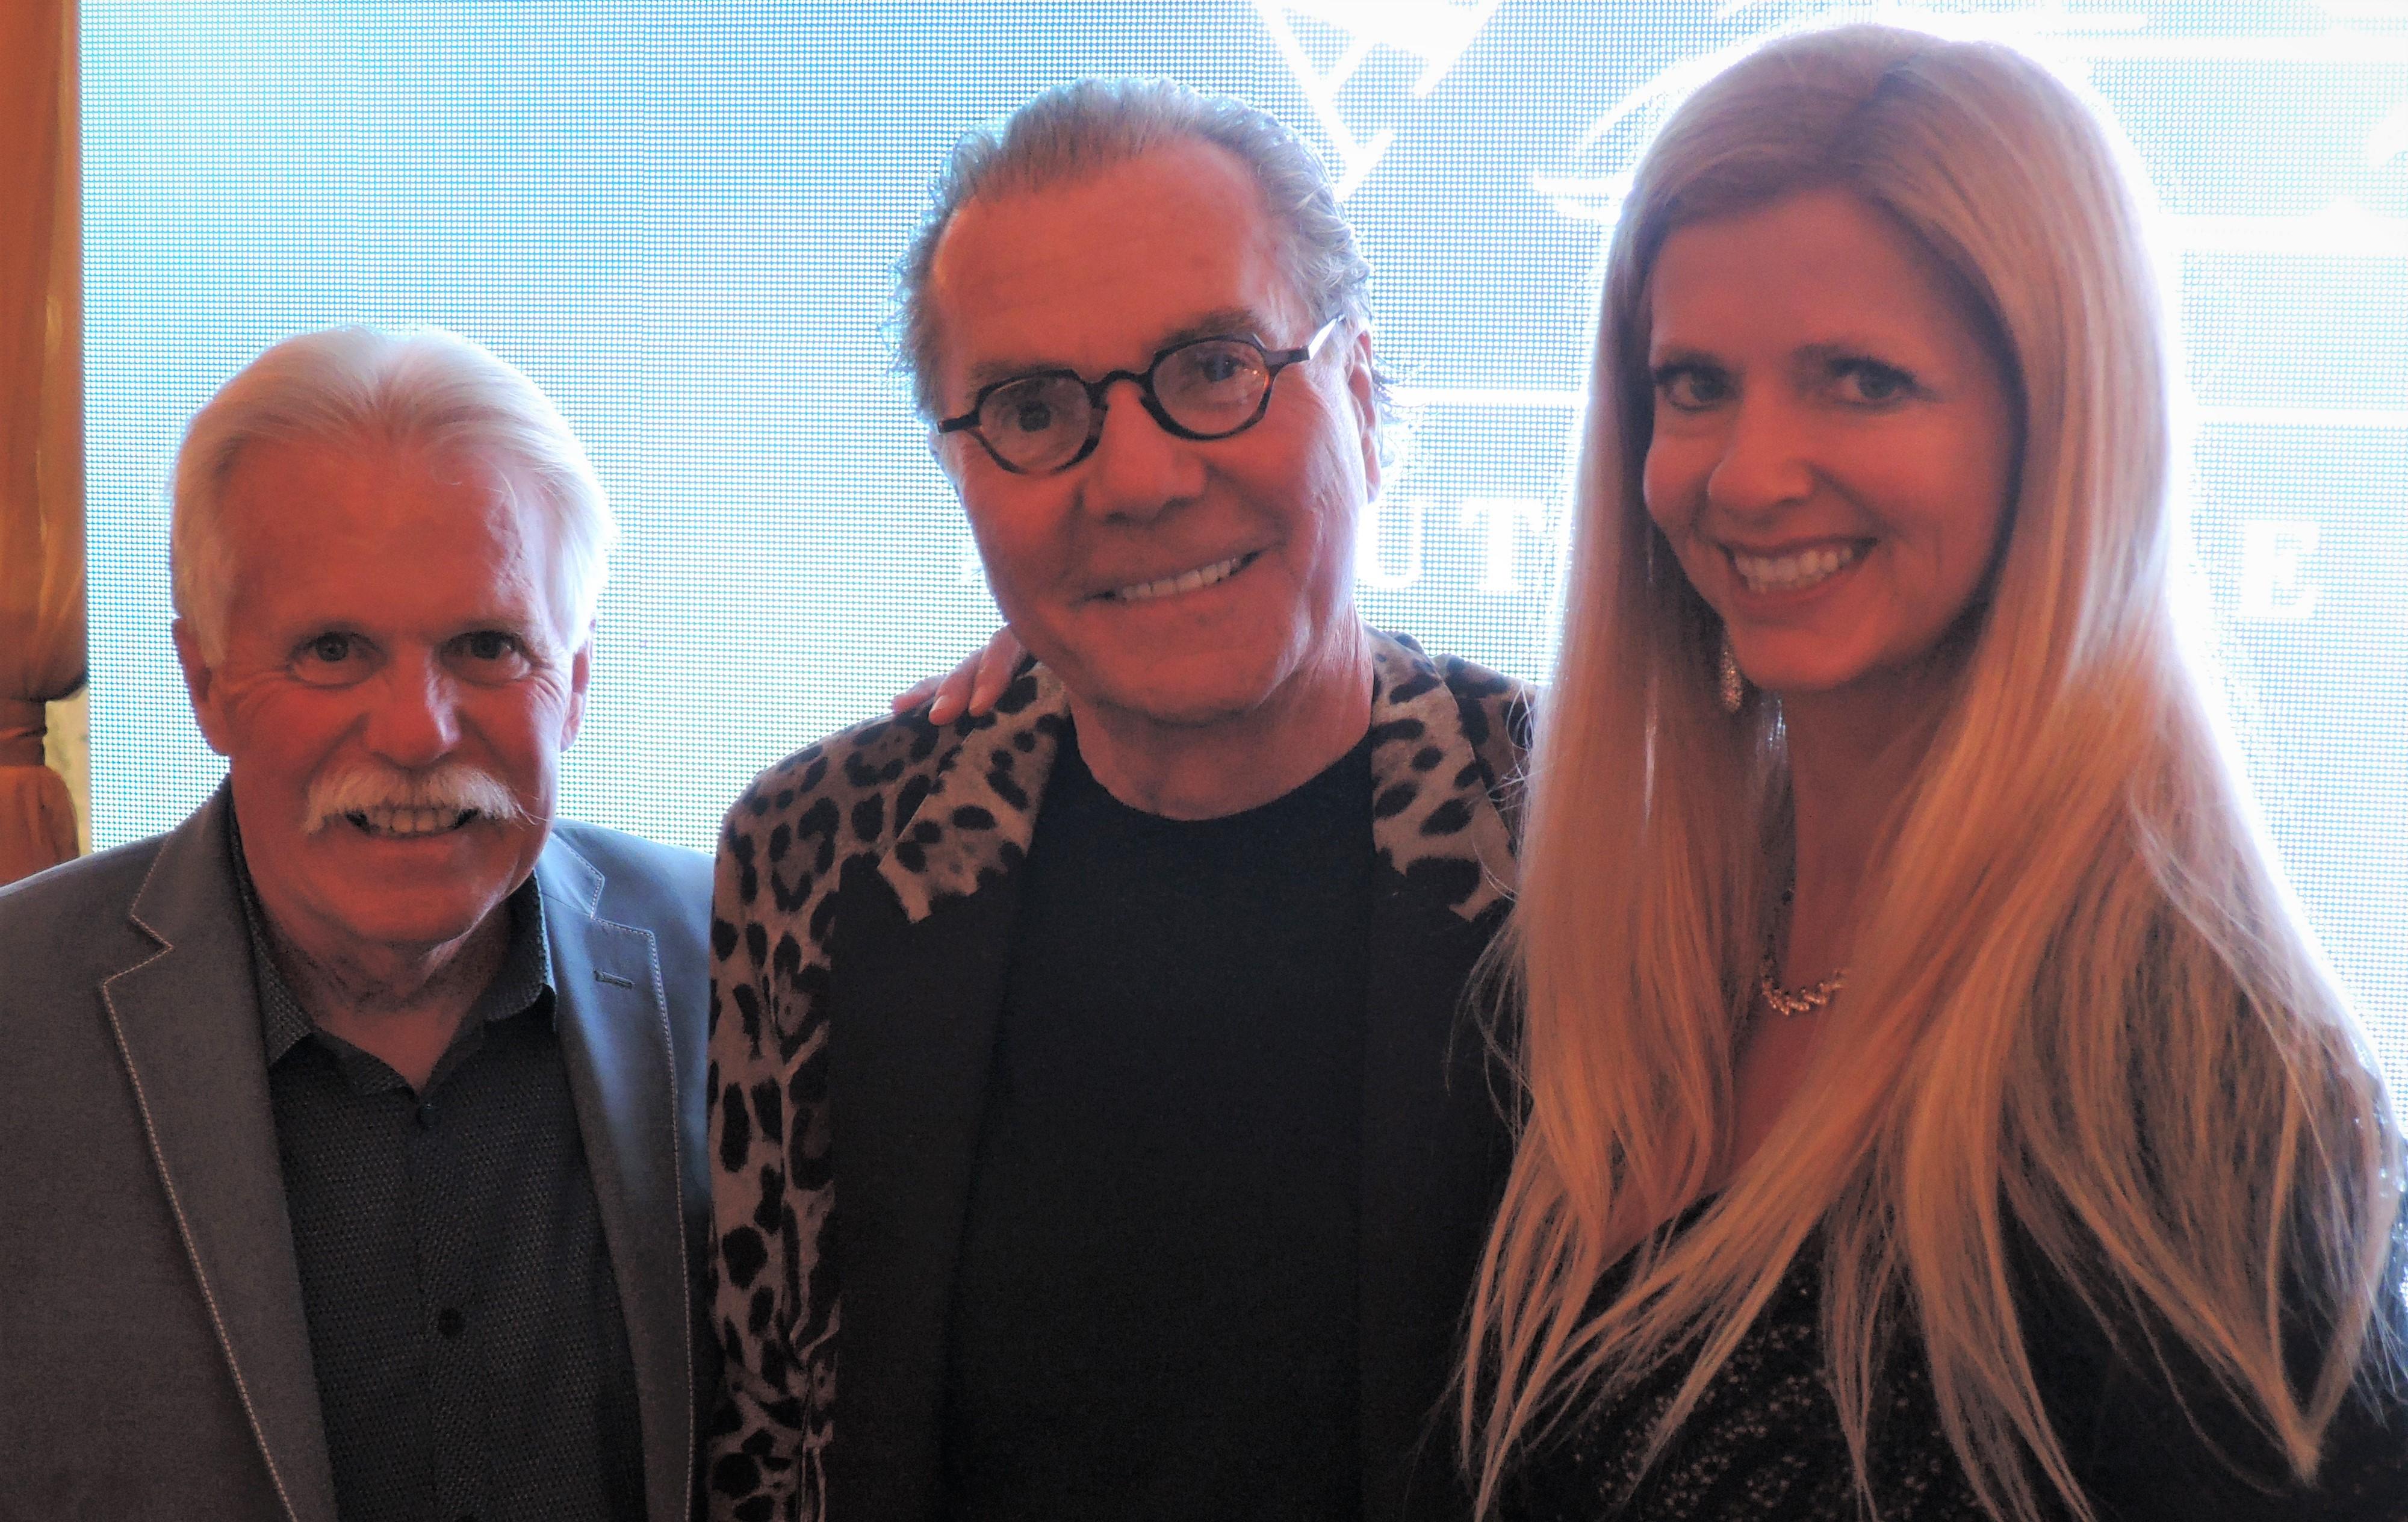 Wayne Carini, Herb Chambers, The Auto Blonde - Audrain Auto Museum Gala 2017